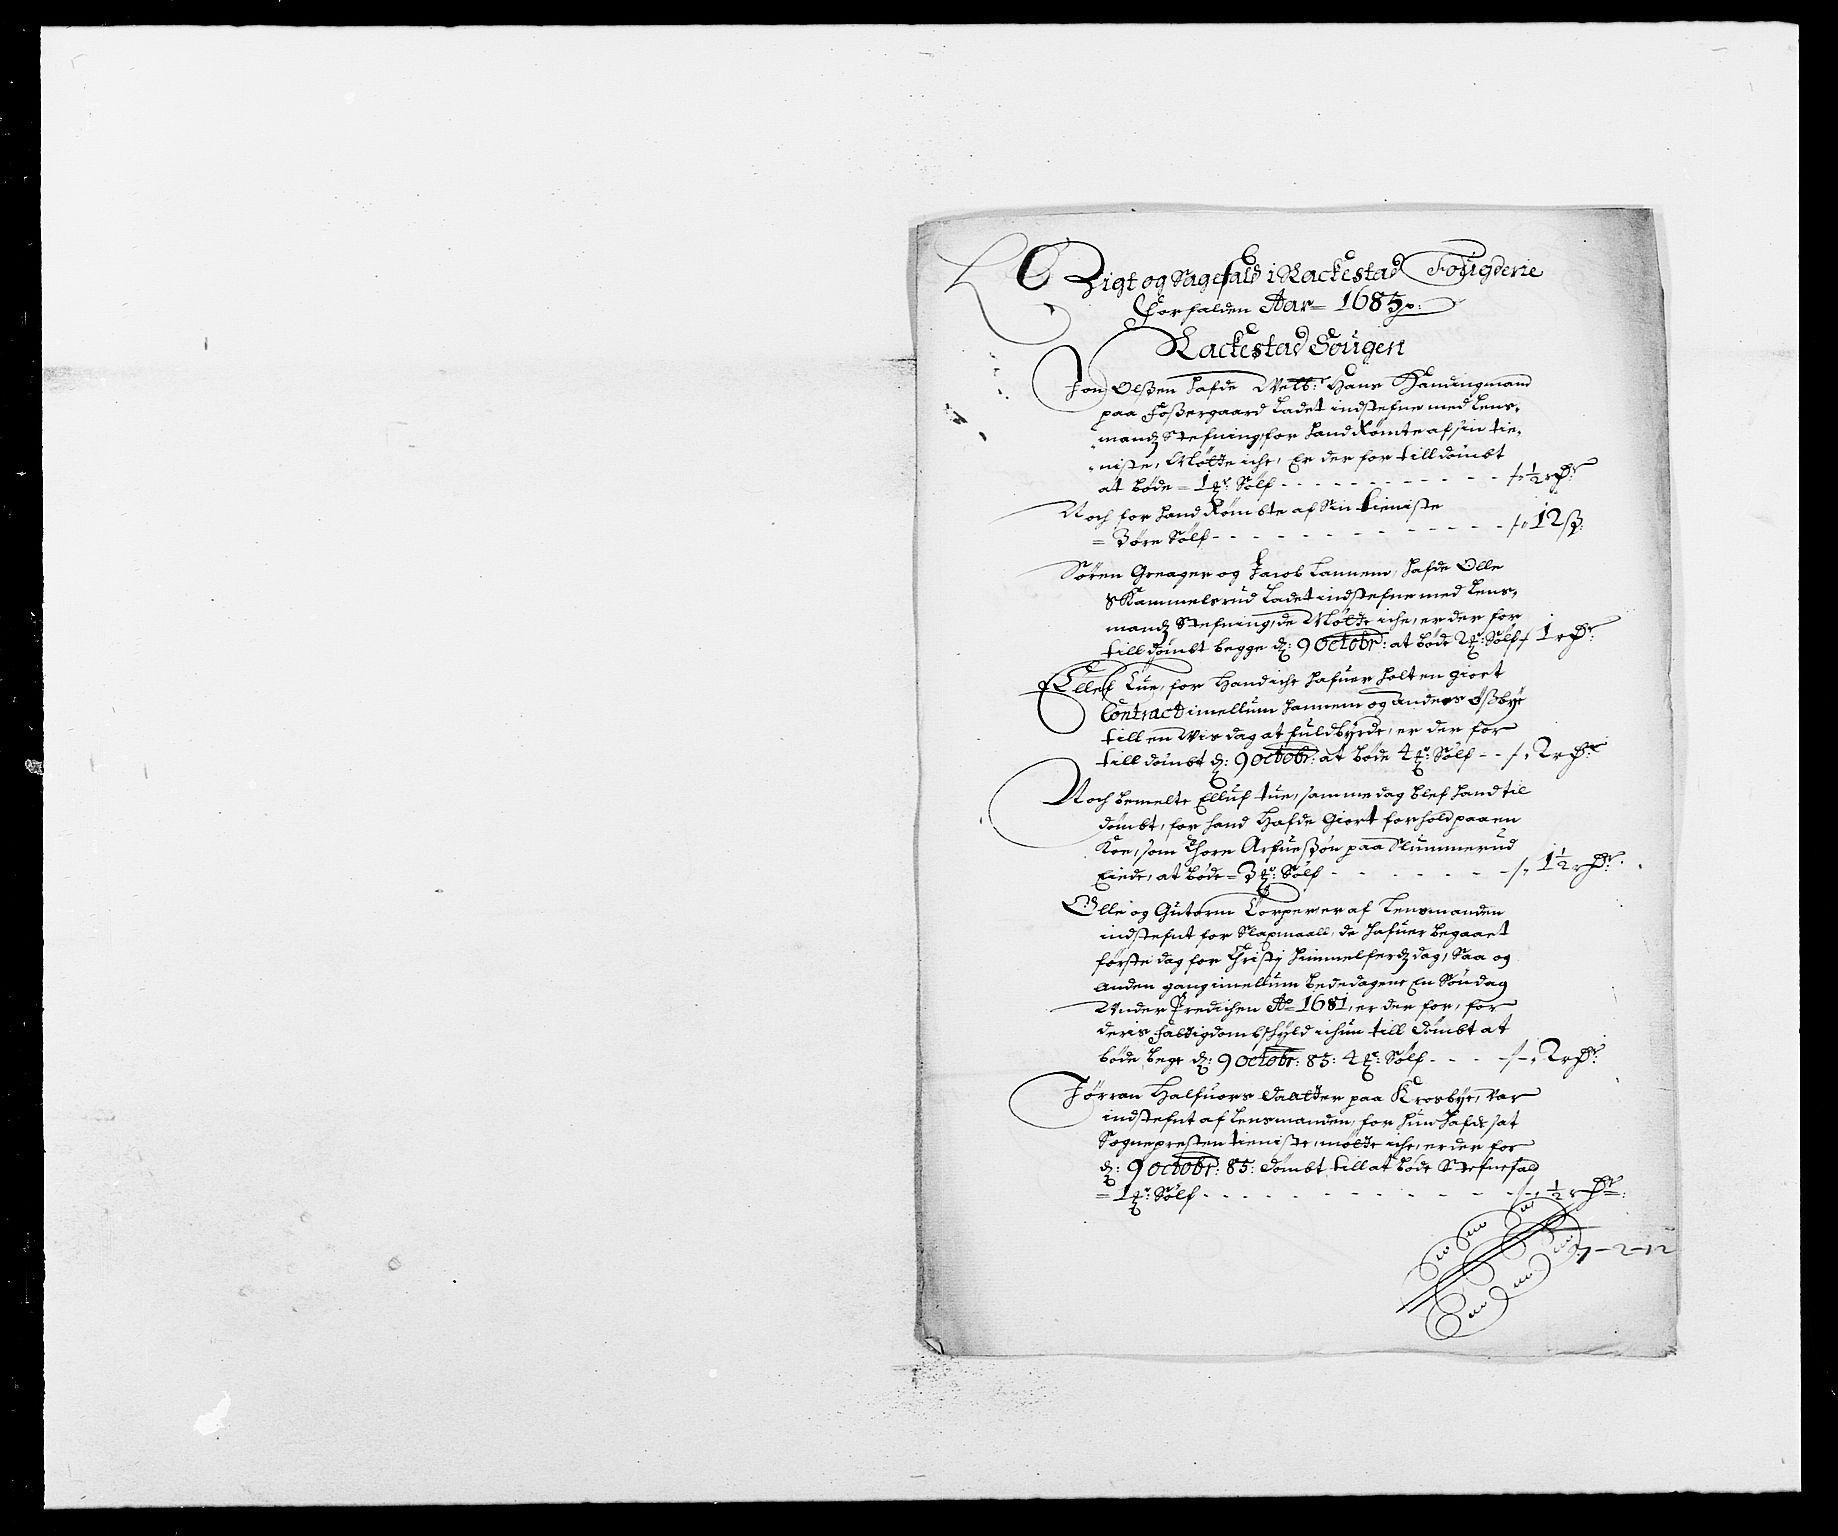 RA, Rentekammeret inntil 1814, Reviderte regnskaper, Fogderegnskap, R05/L0275: Fogderegnskap Rakkestad, 1685-1686, s. 57